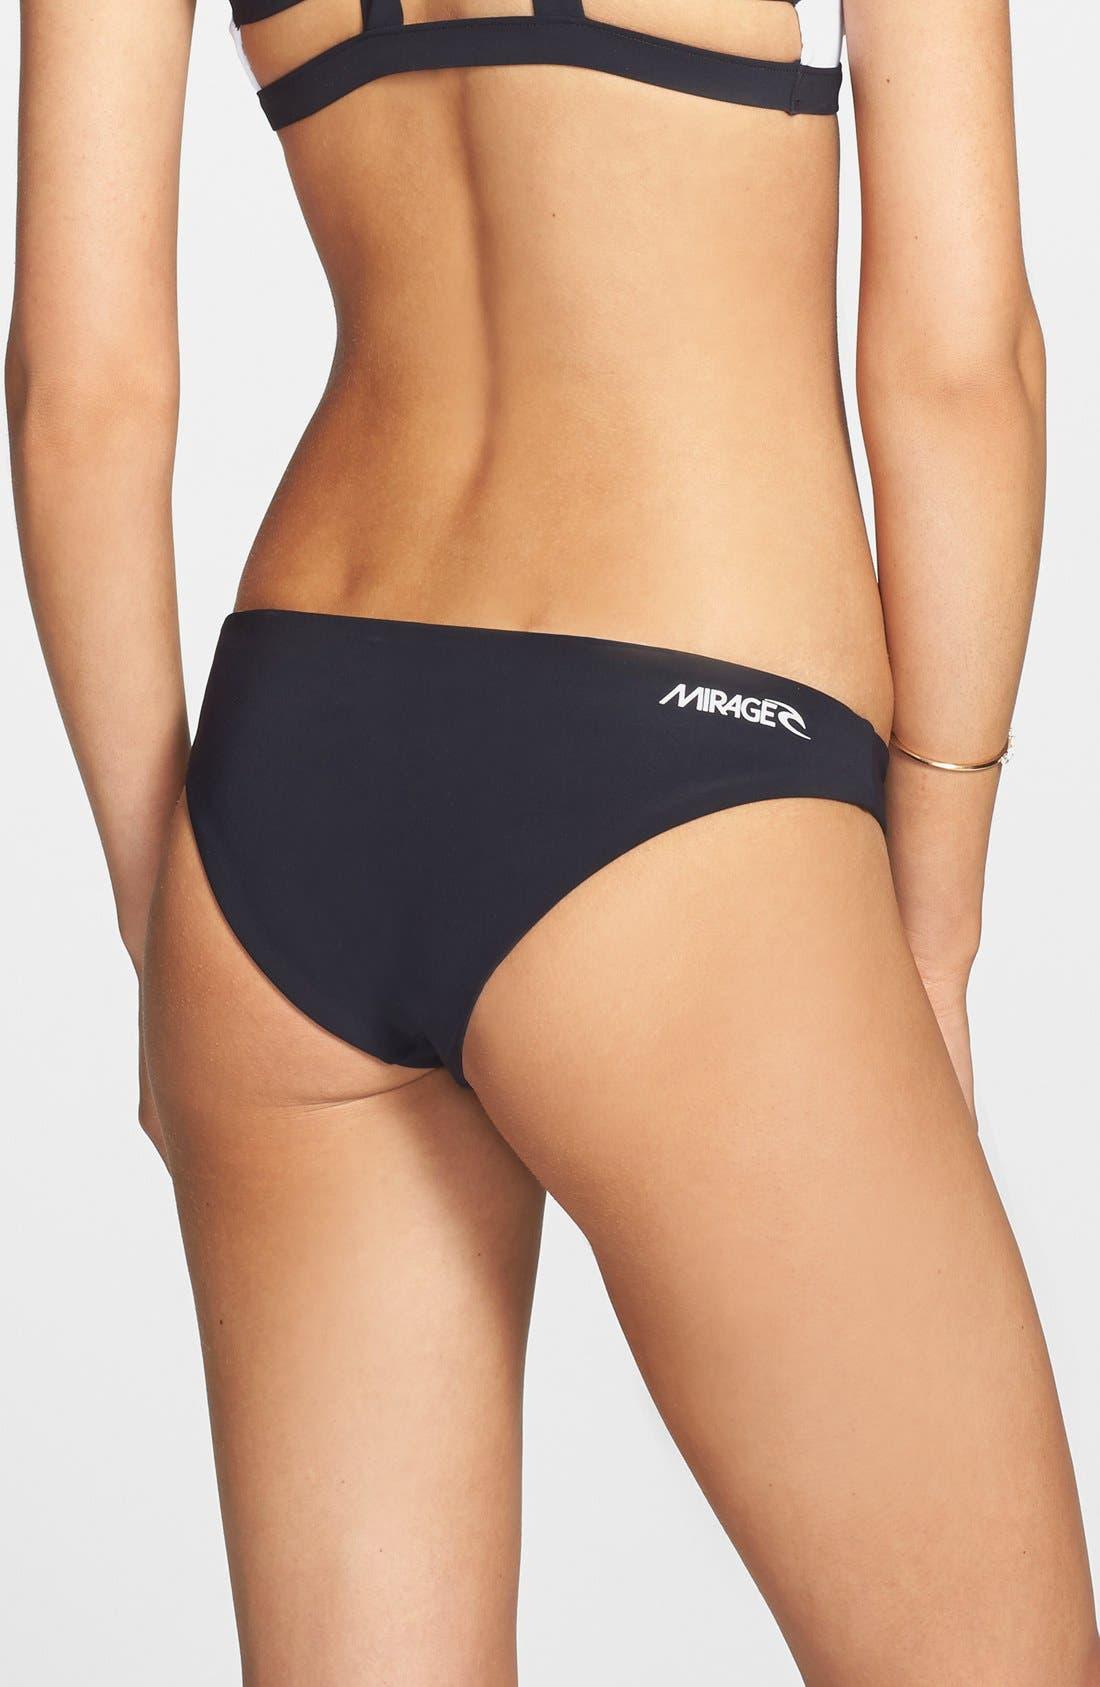 Alternate Image 1 Selected - Rip Curl 'Mirage' Reversible Hipster Bikini Bottoms (Juniors)